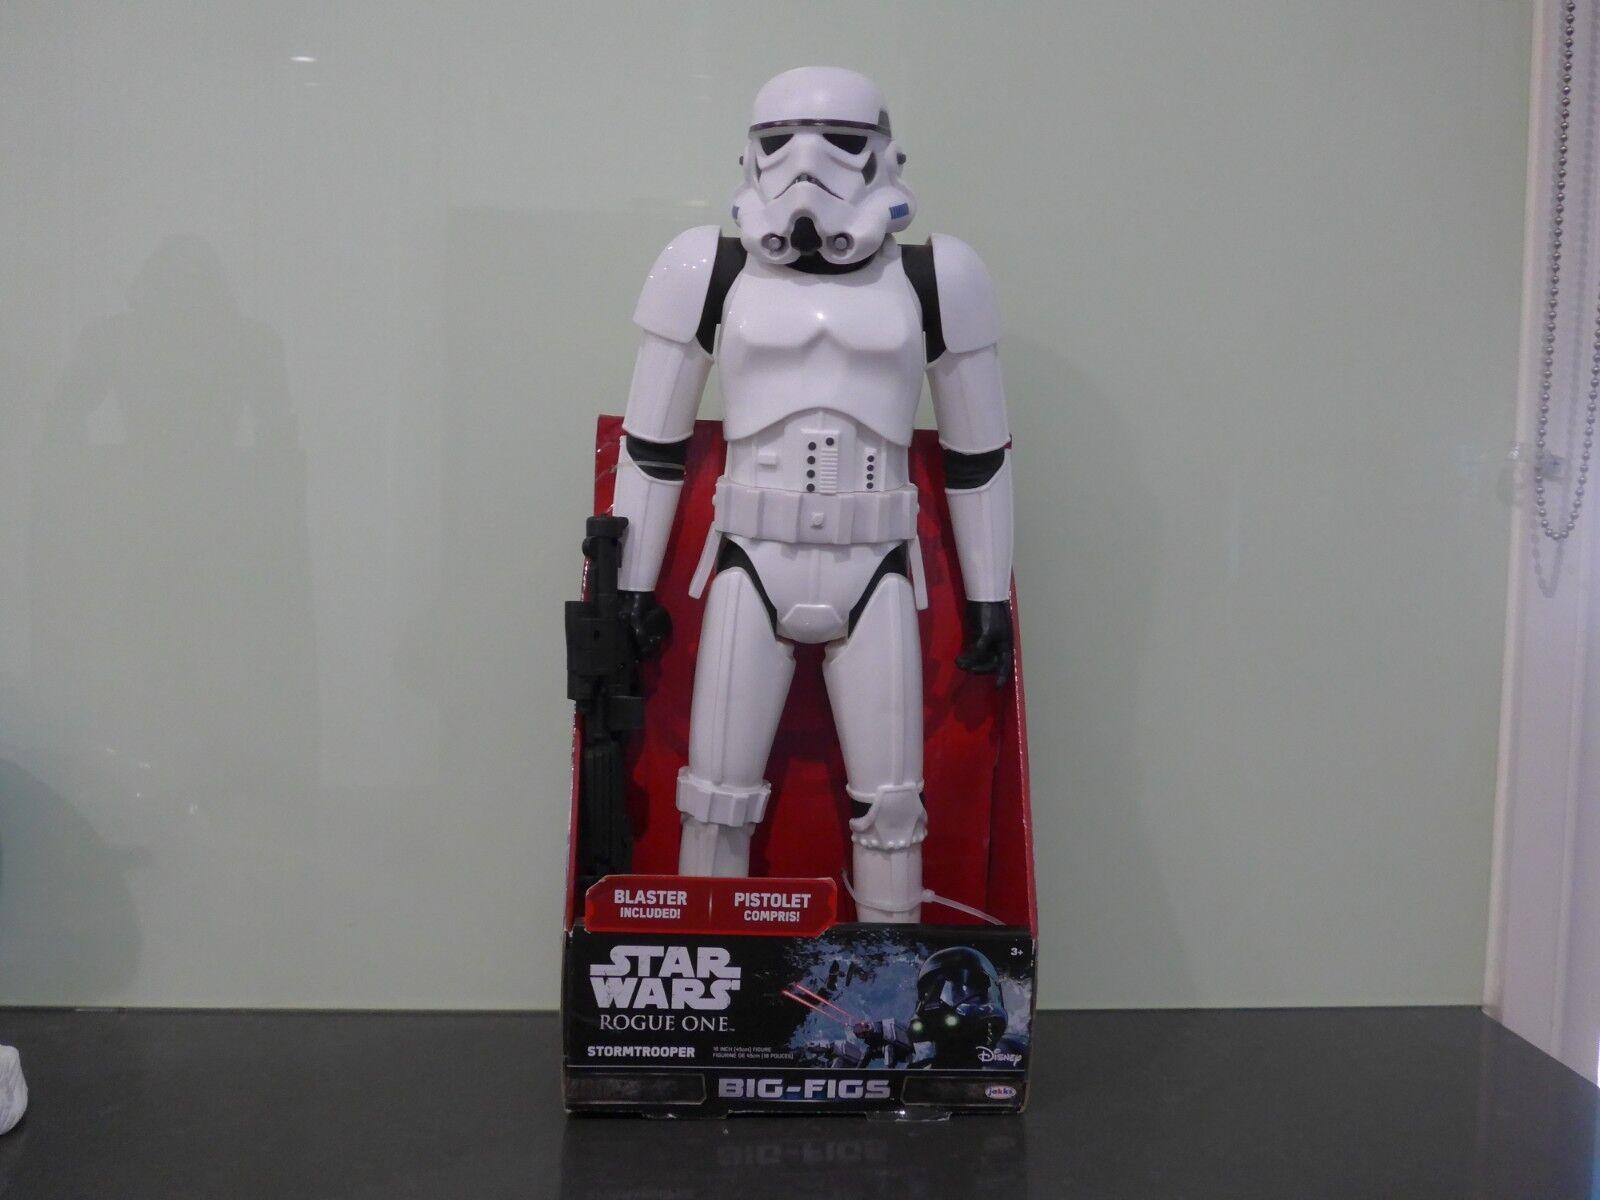 Star Wars Rogue one 45 cms high Figurine